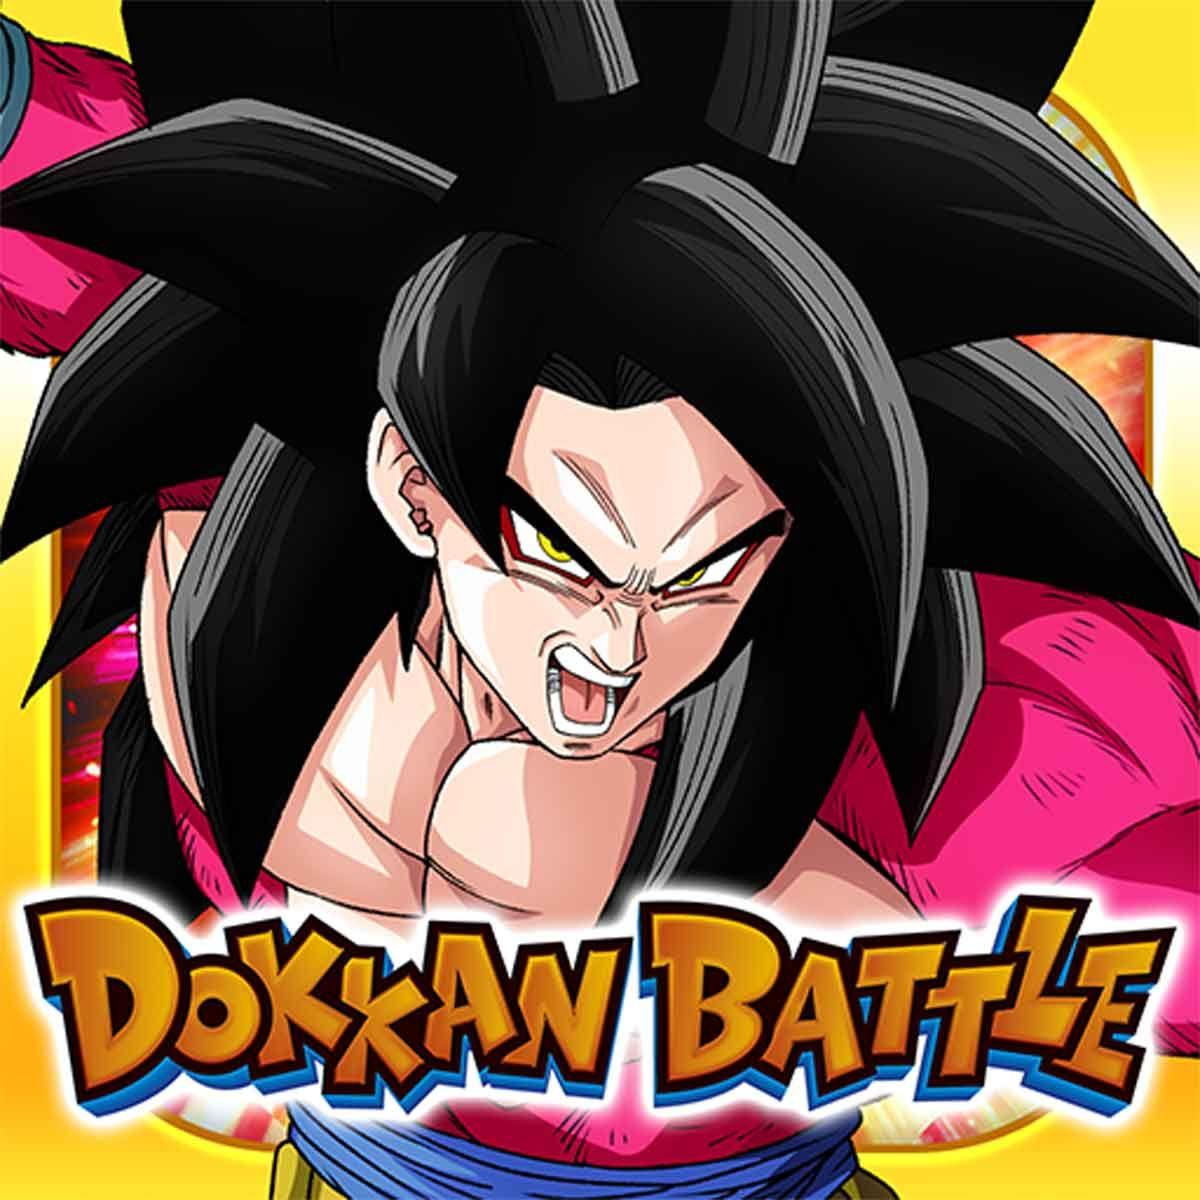 dragon ball dokkan battle mod apk 4.1.1